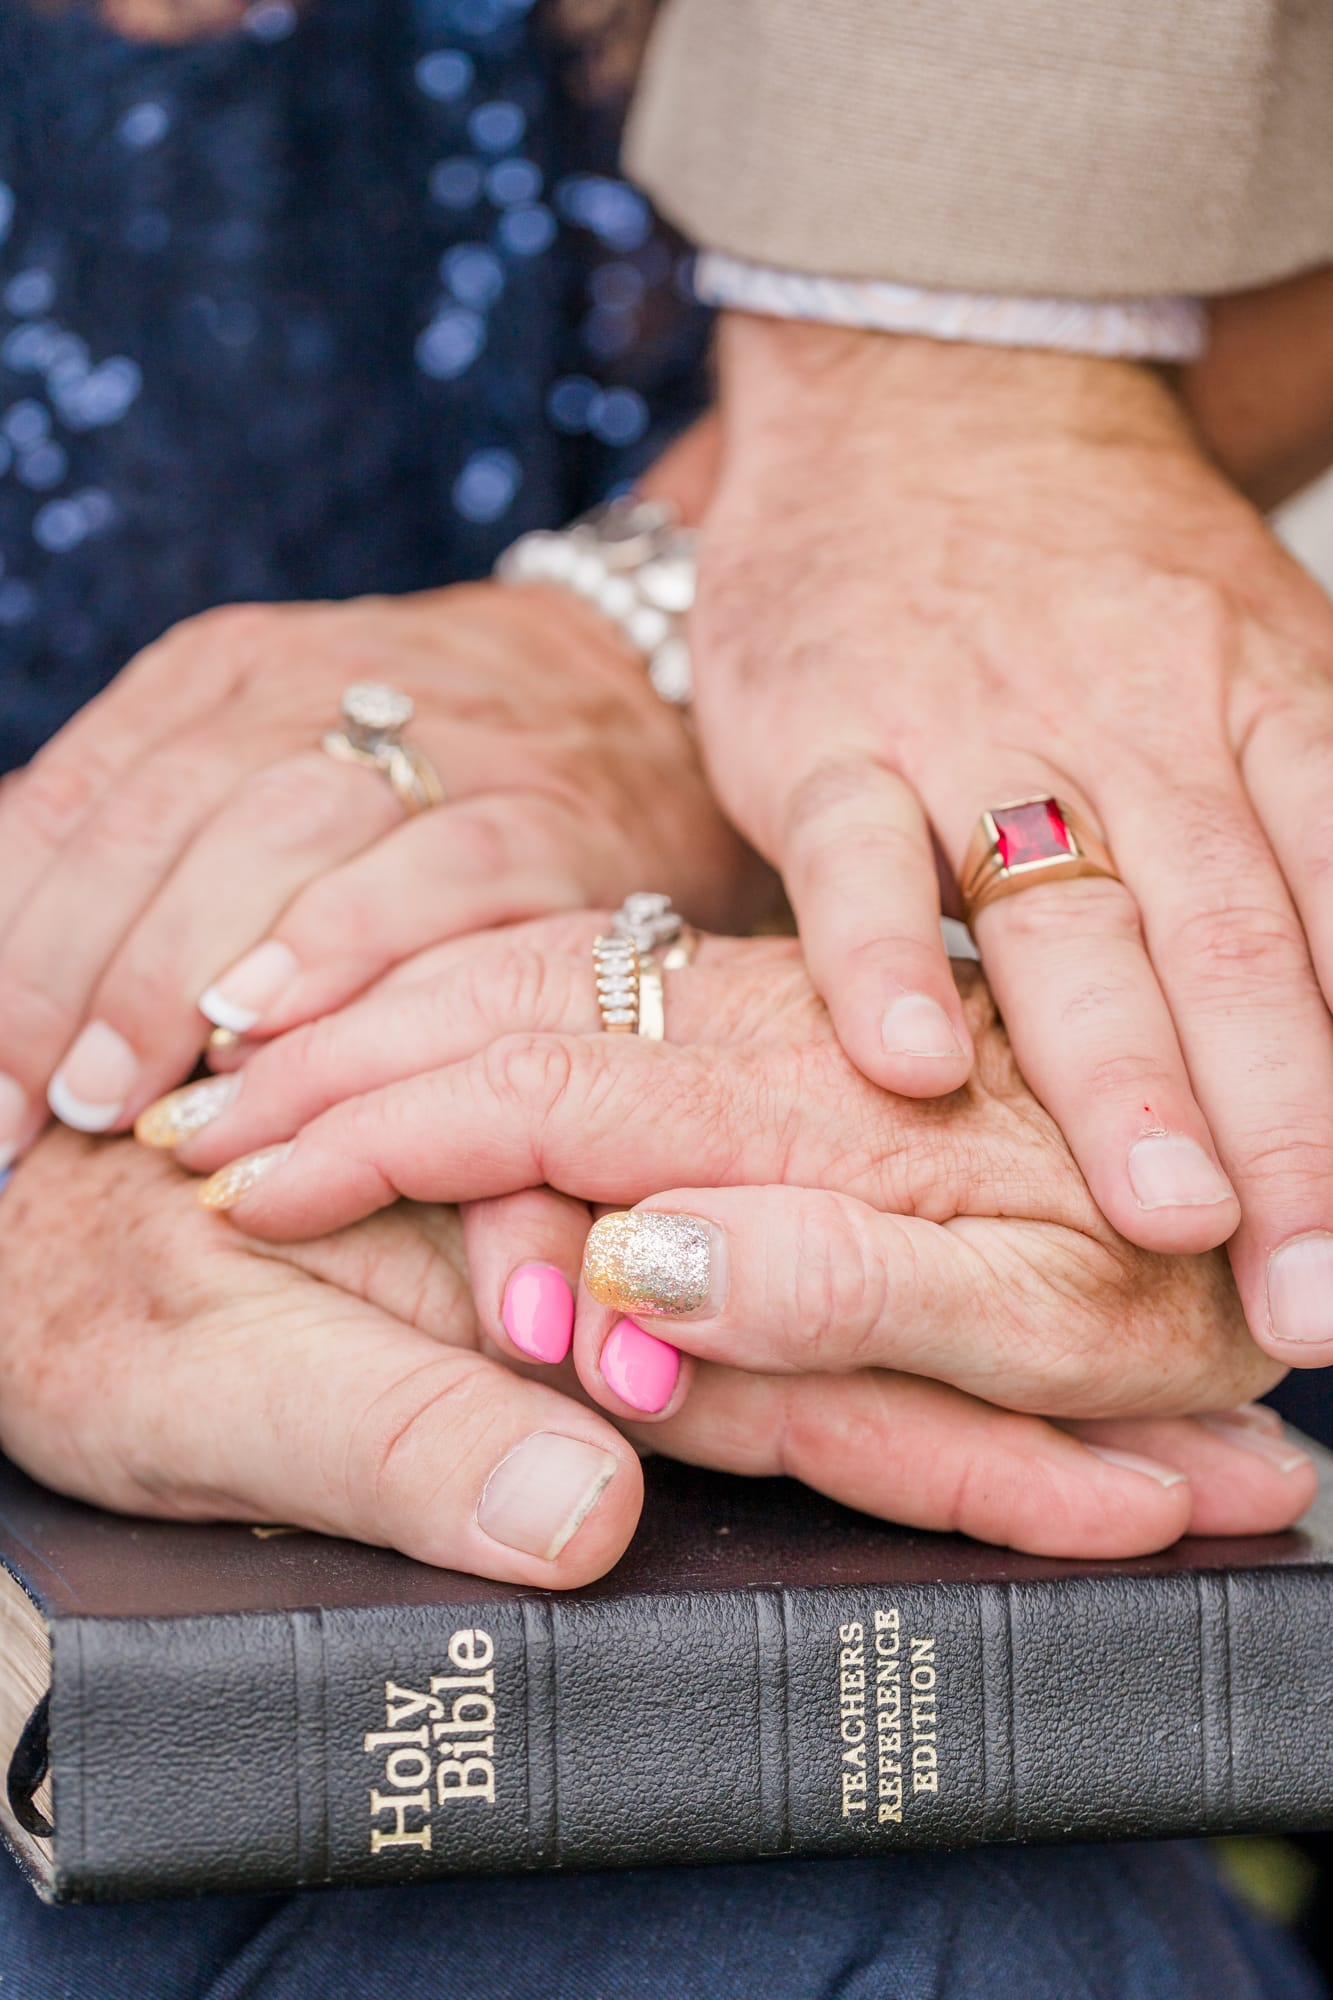 Generational hands portrait at Penn State arboretum